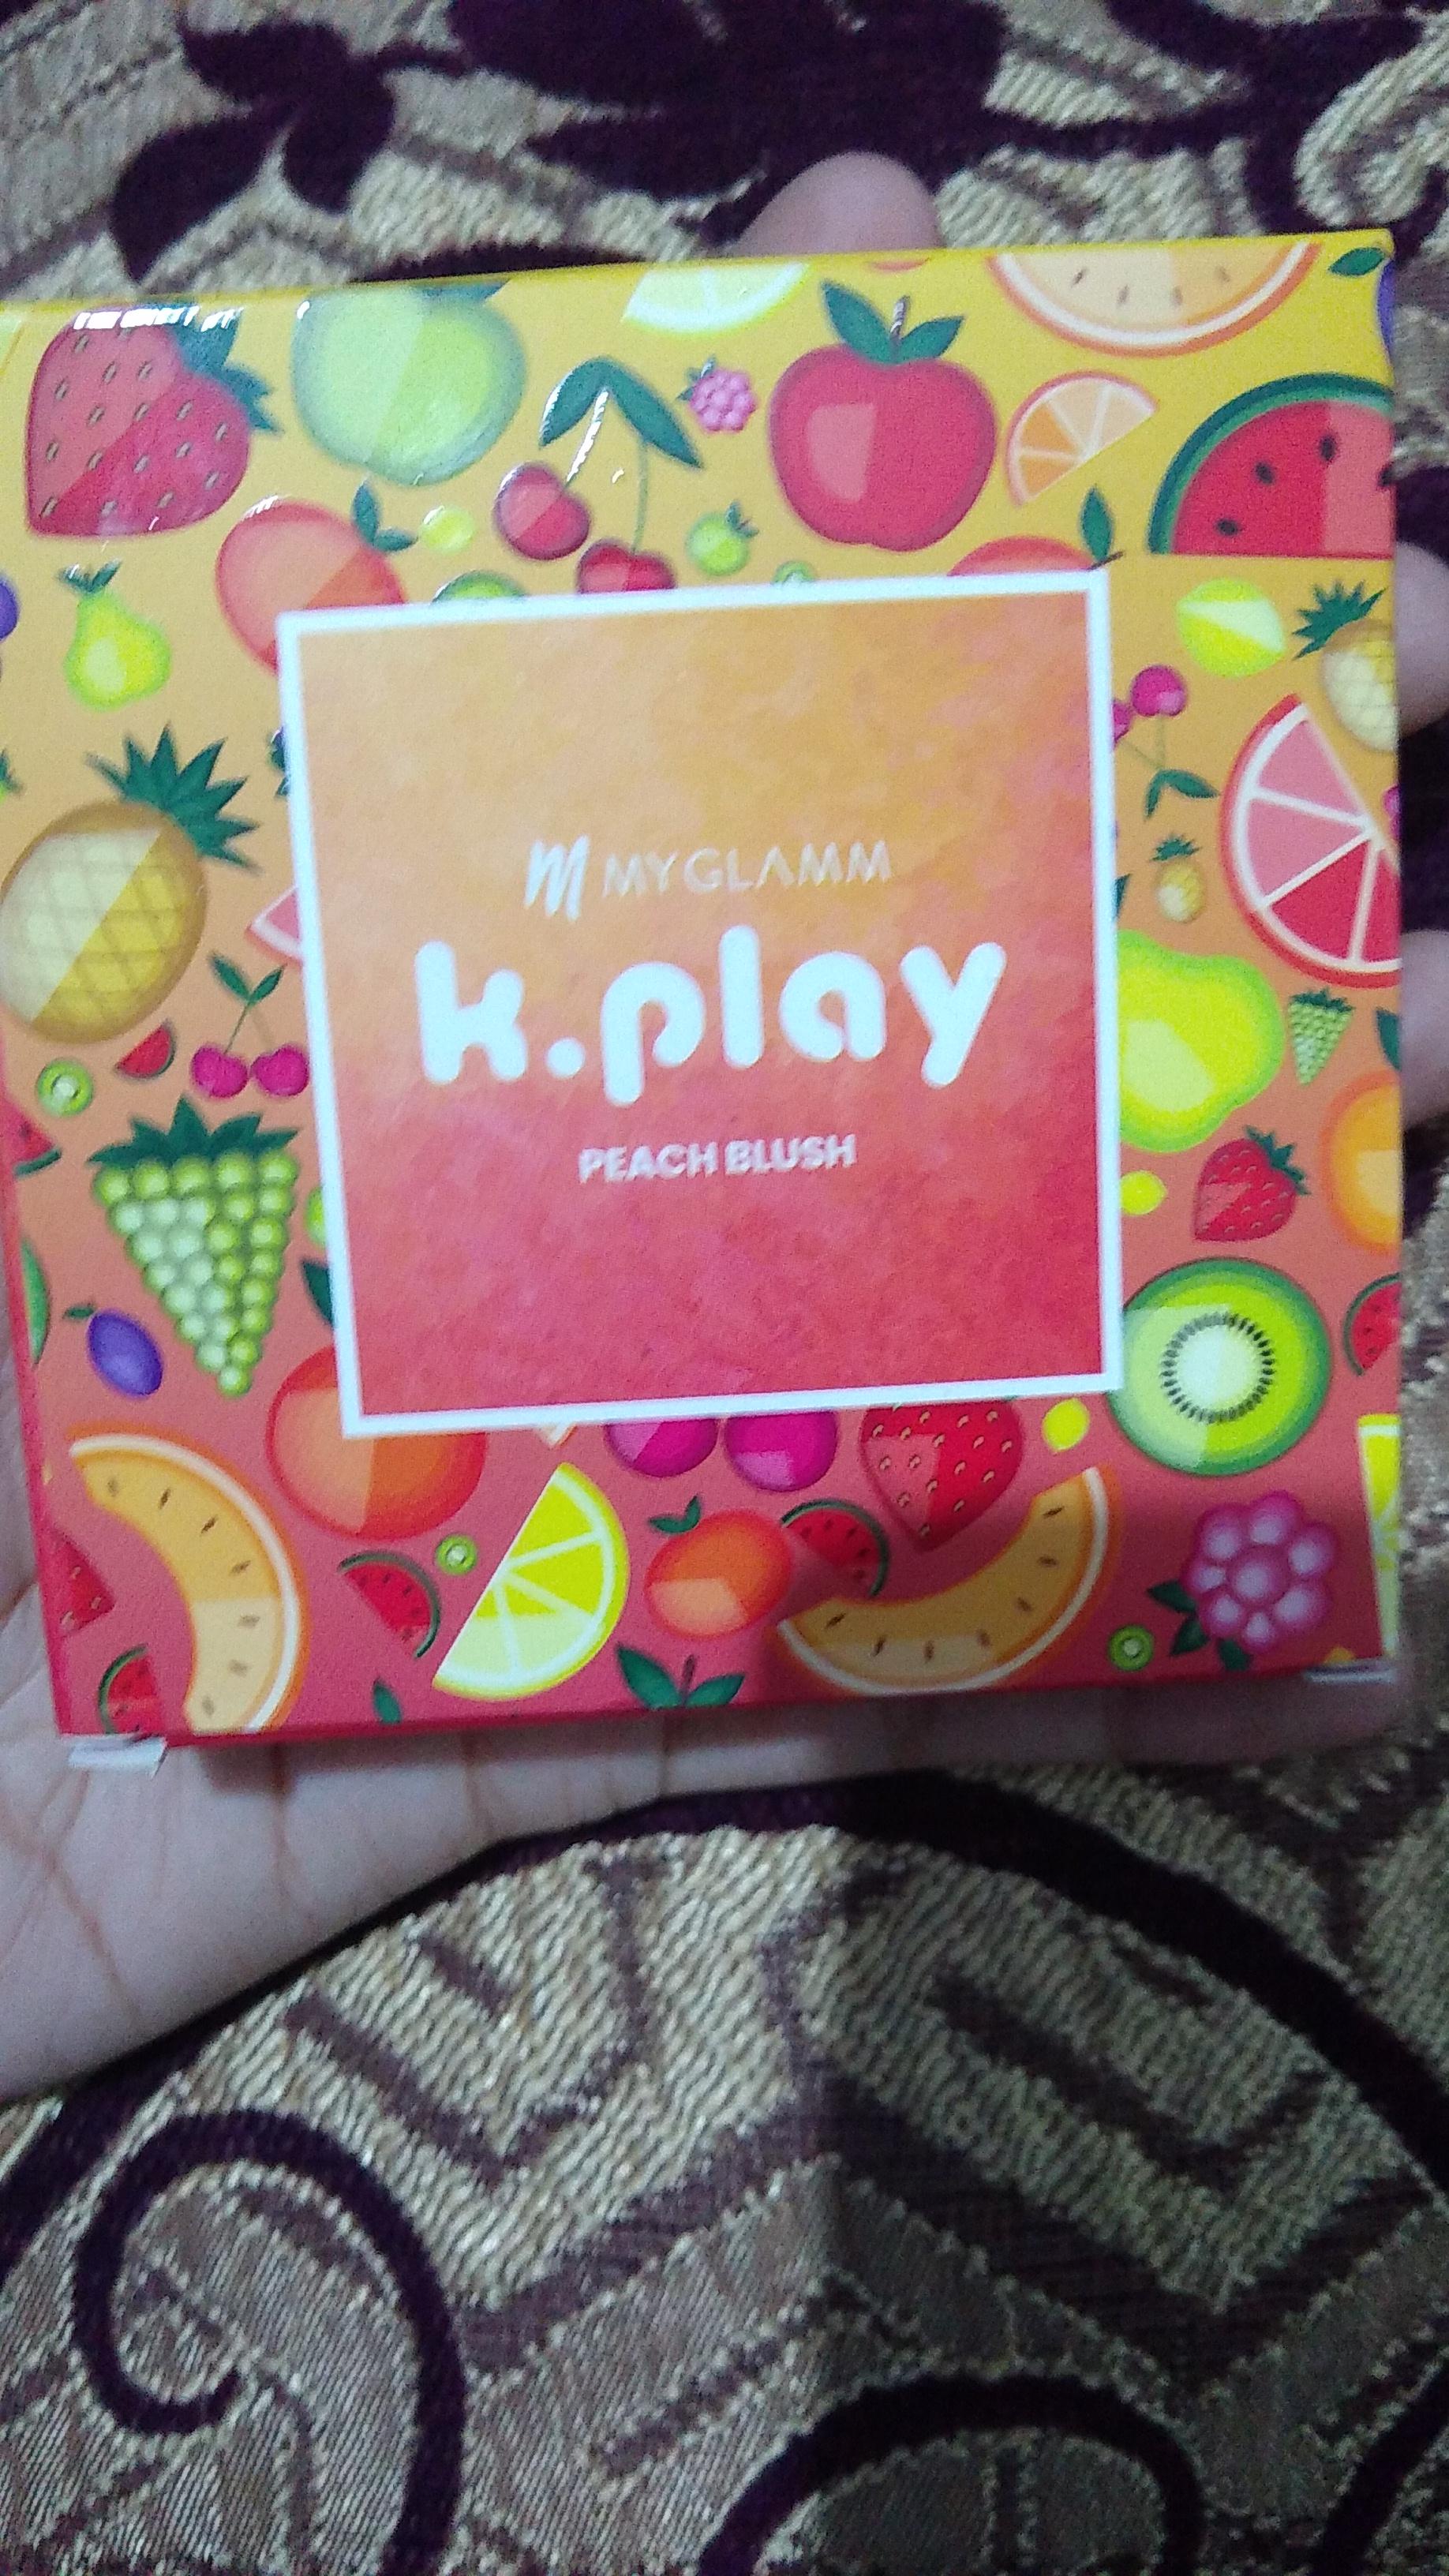 MyGlamm K.PLAY FLAVOURED BLUSH – SWEET PEACH-Matte peachy blush-By lilgirl27